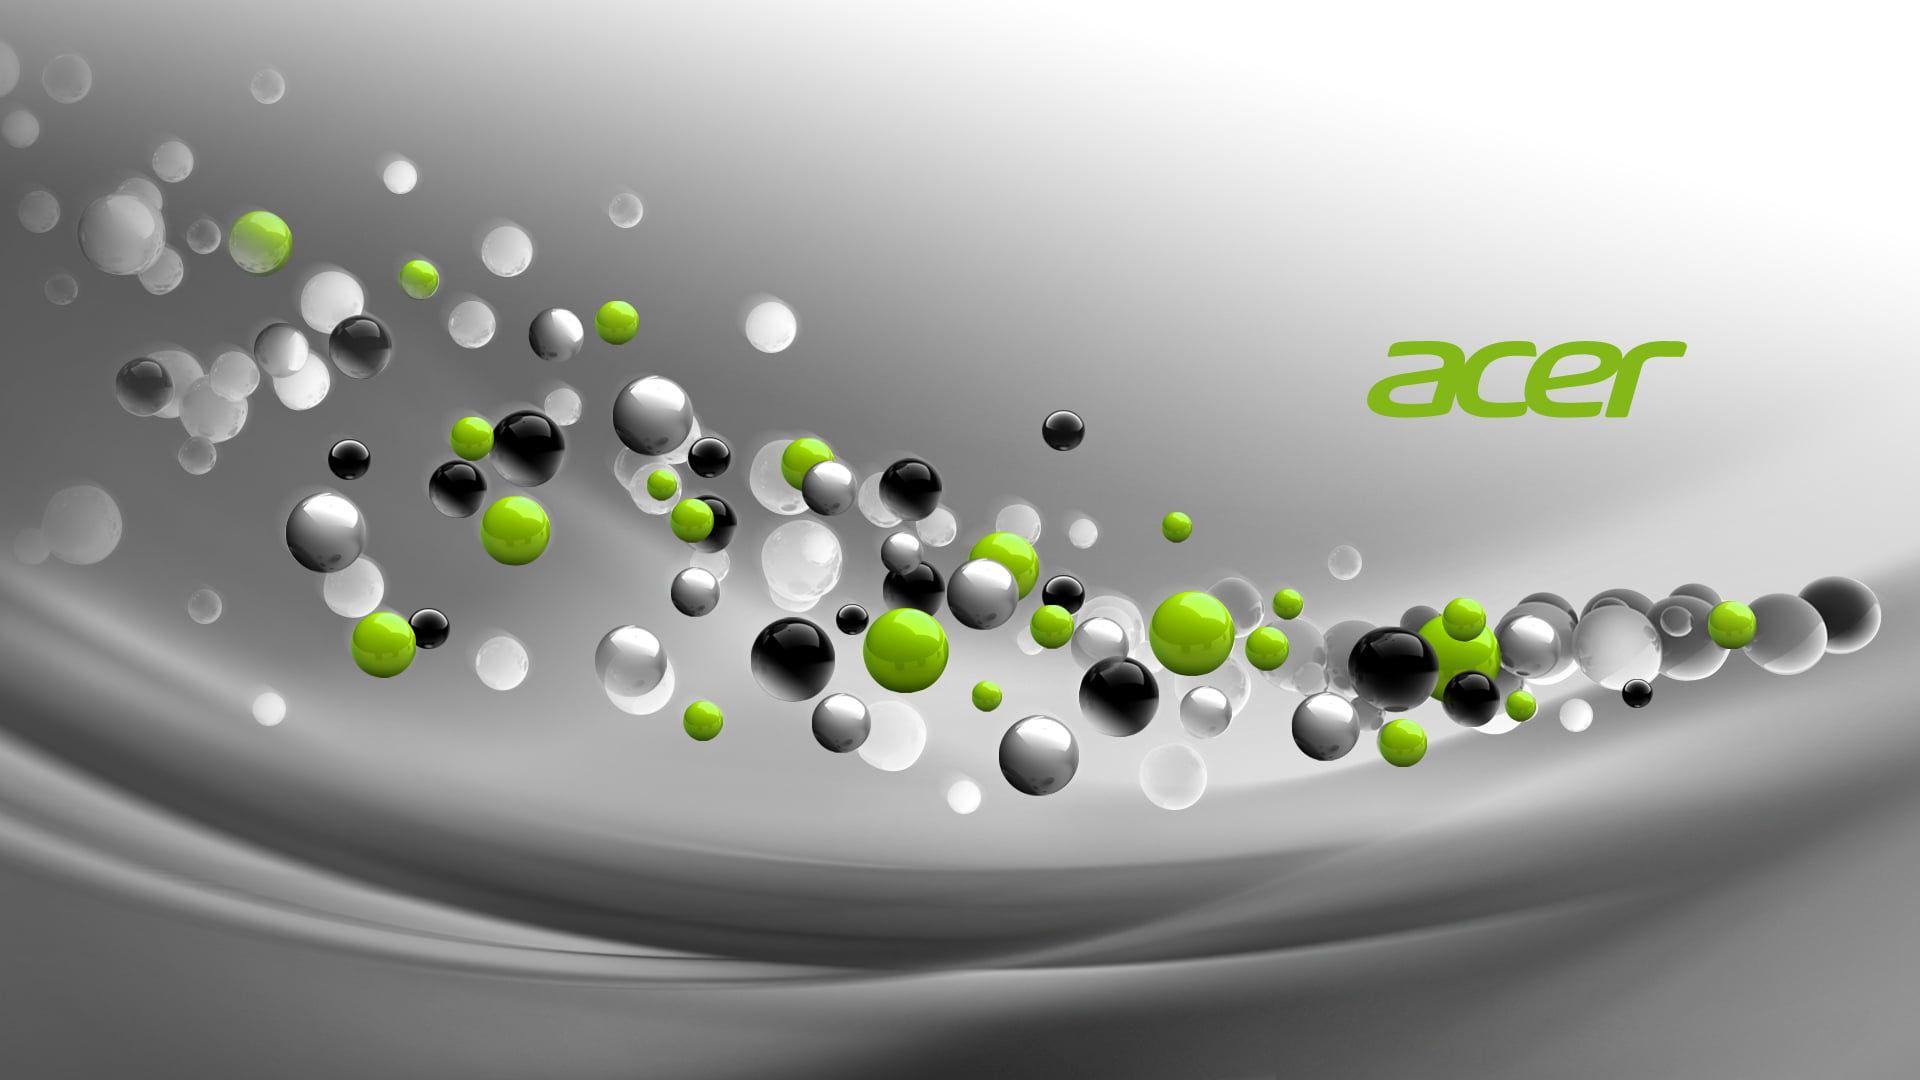 Acer Logo Wallpaper Background Chainimage 1280 800 Acer Logo Wallpapers 35 Wallpapers Adorable Wallpapers Laptop Acer Acer Desktop Laptop Wallpaper